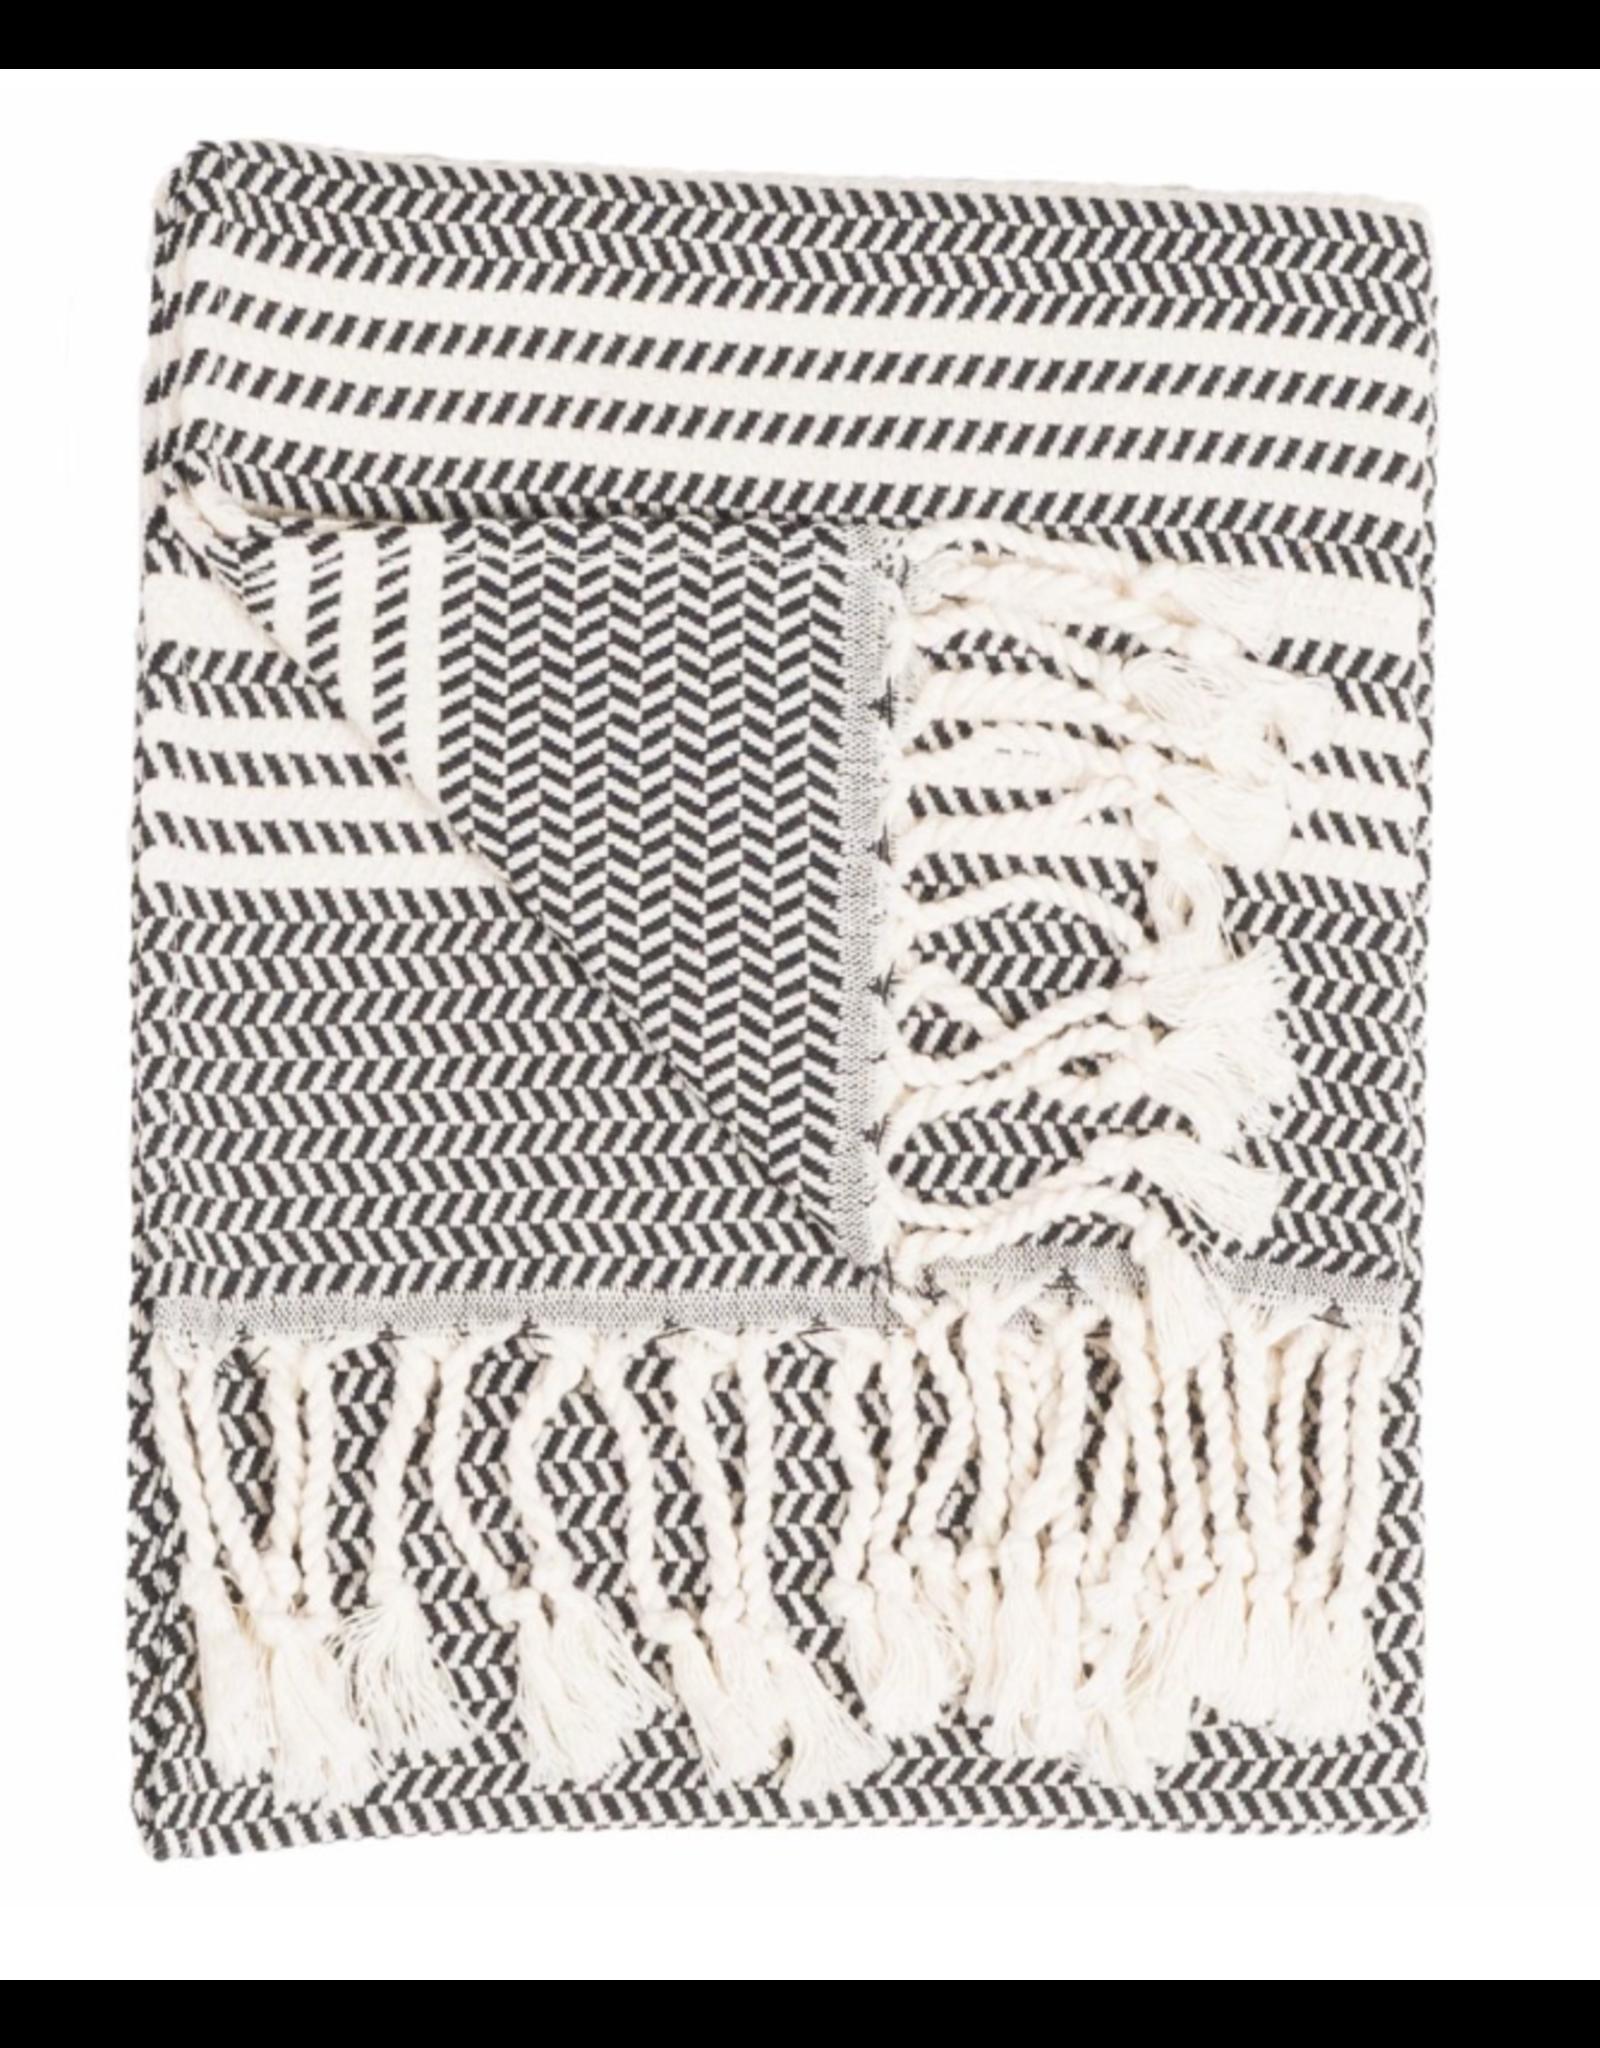 Turkish Hand Towel Hasir - Carbon